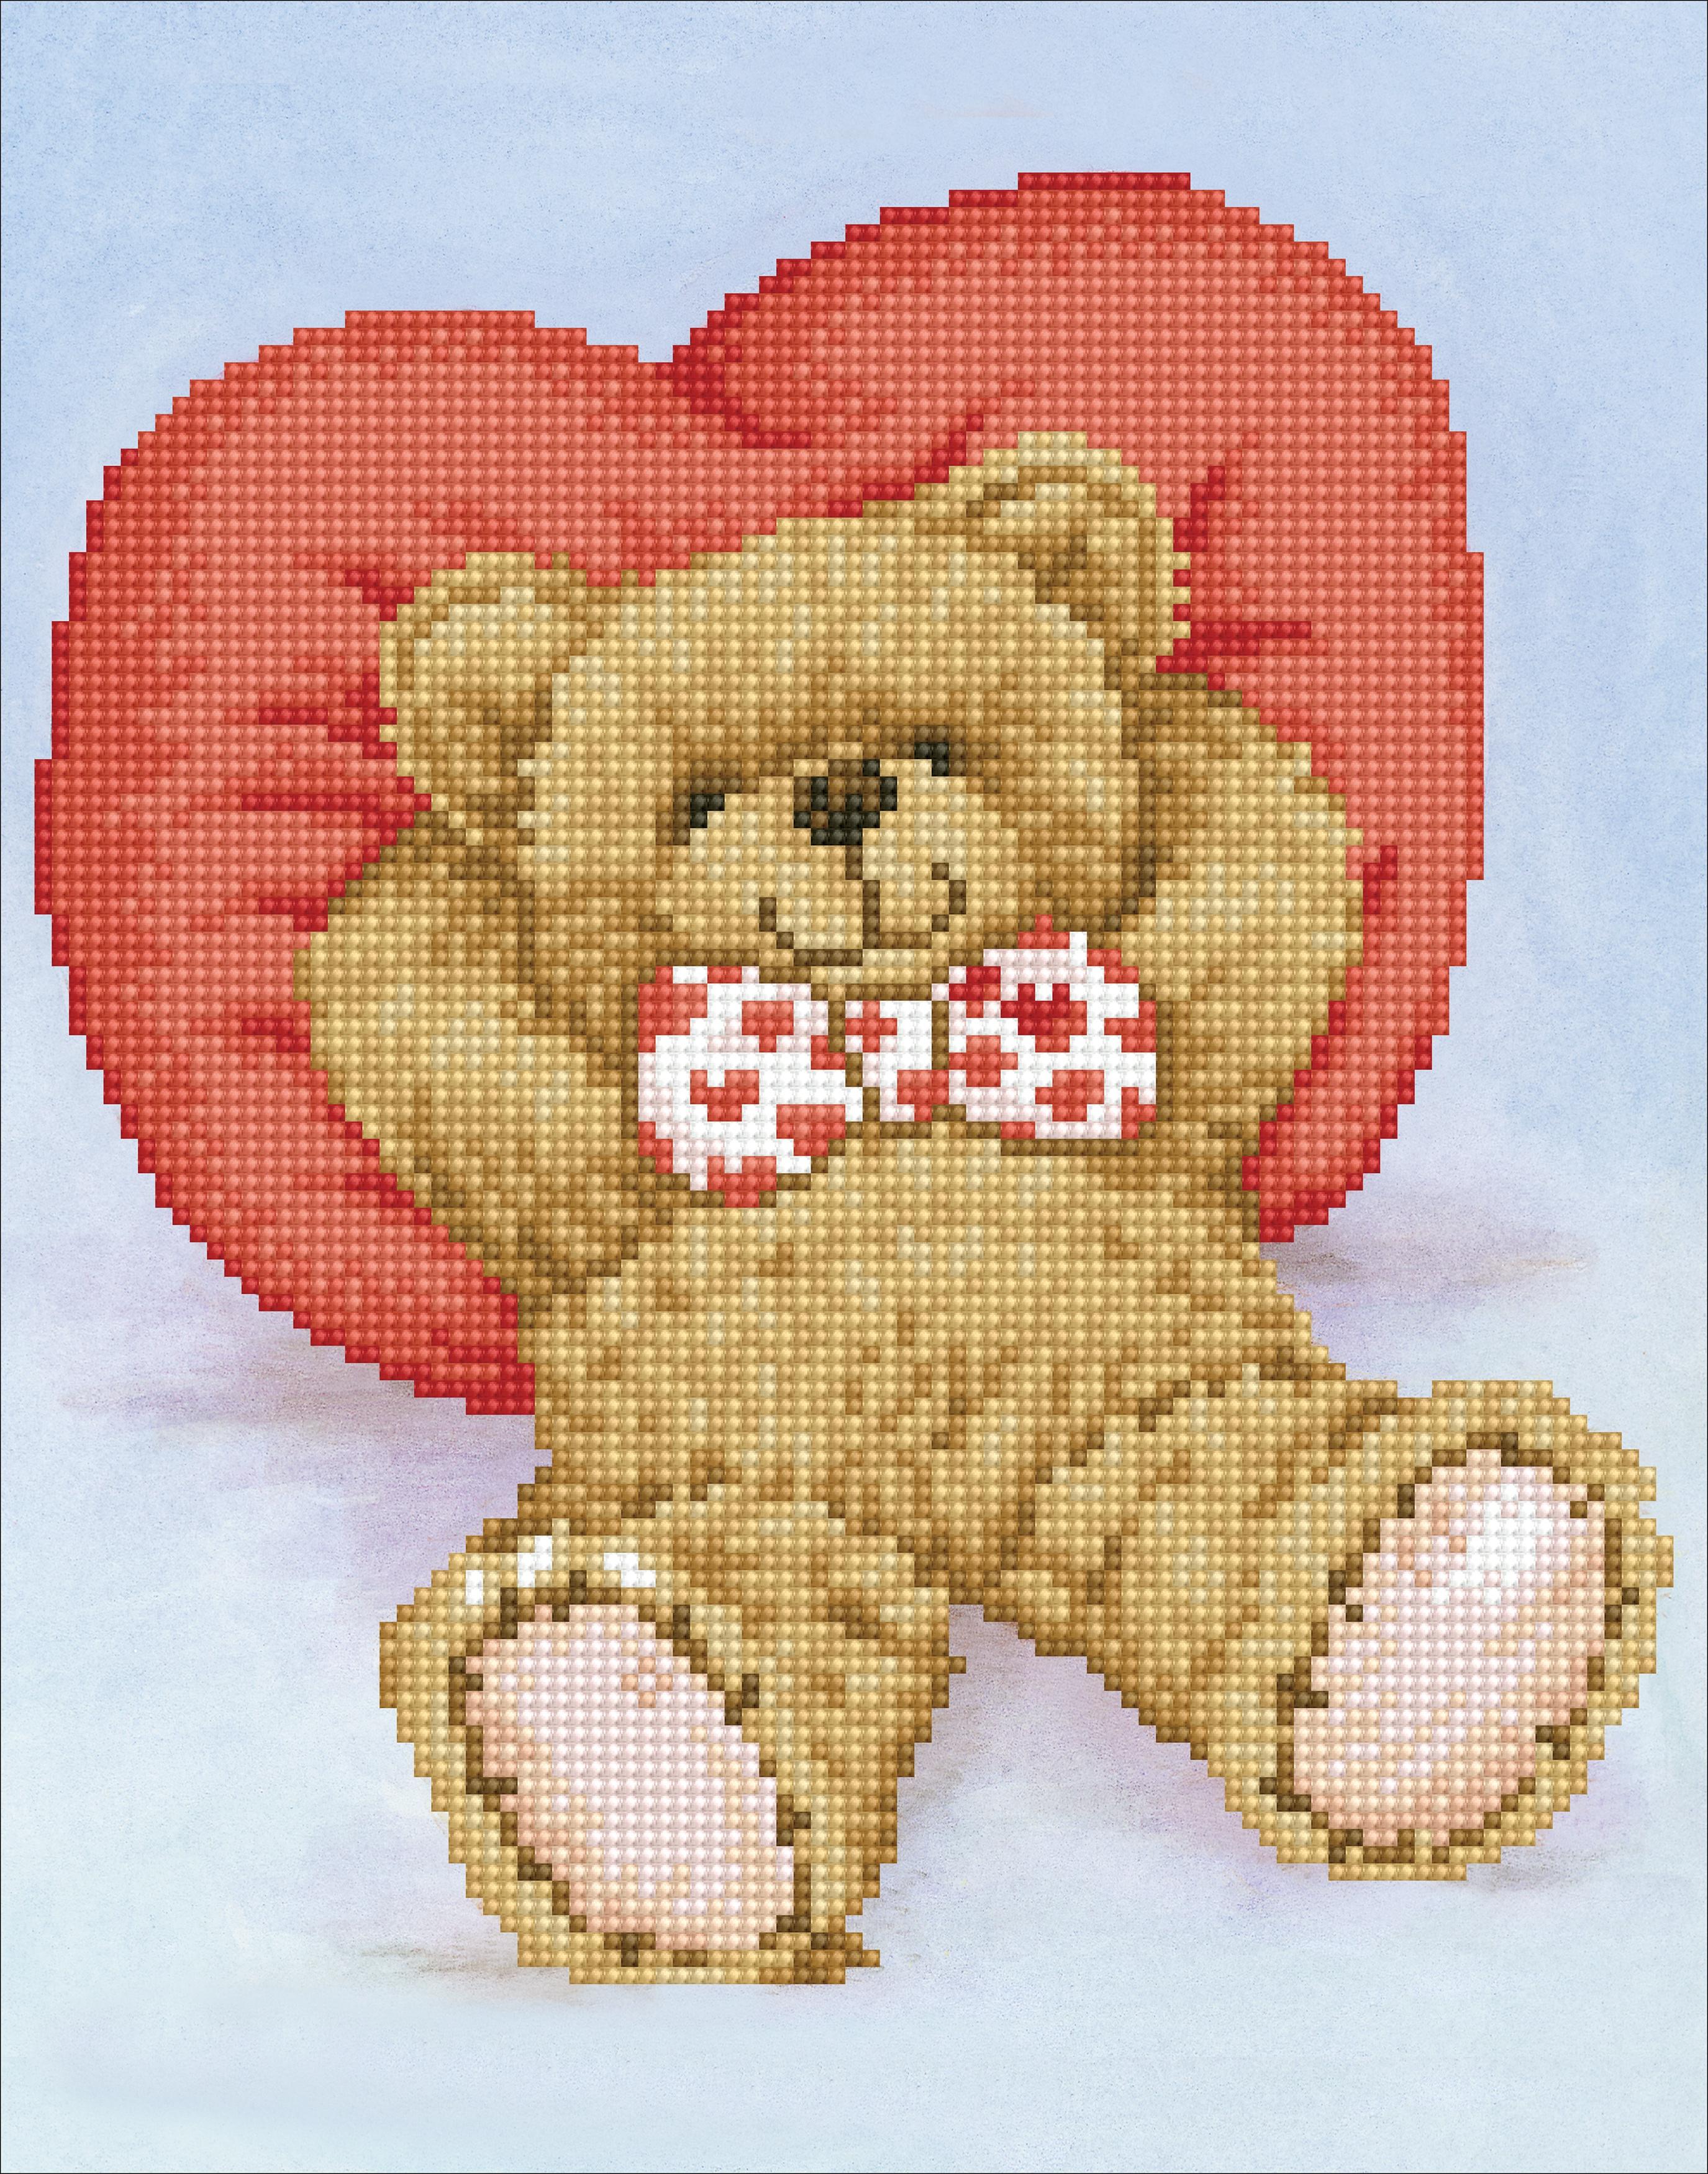 Diamond Dotz Diamond Embroidery Facet Art Kit 10.6X13.8-Relax-A-Bear